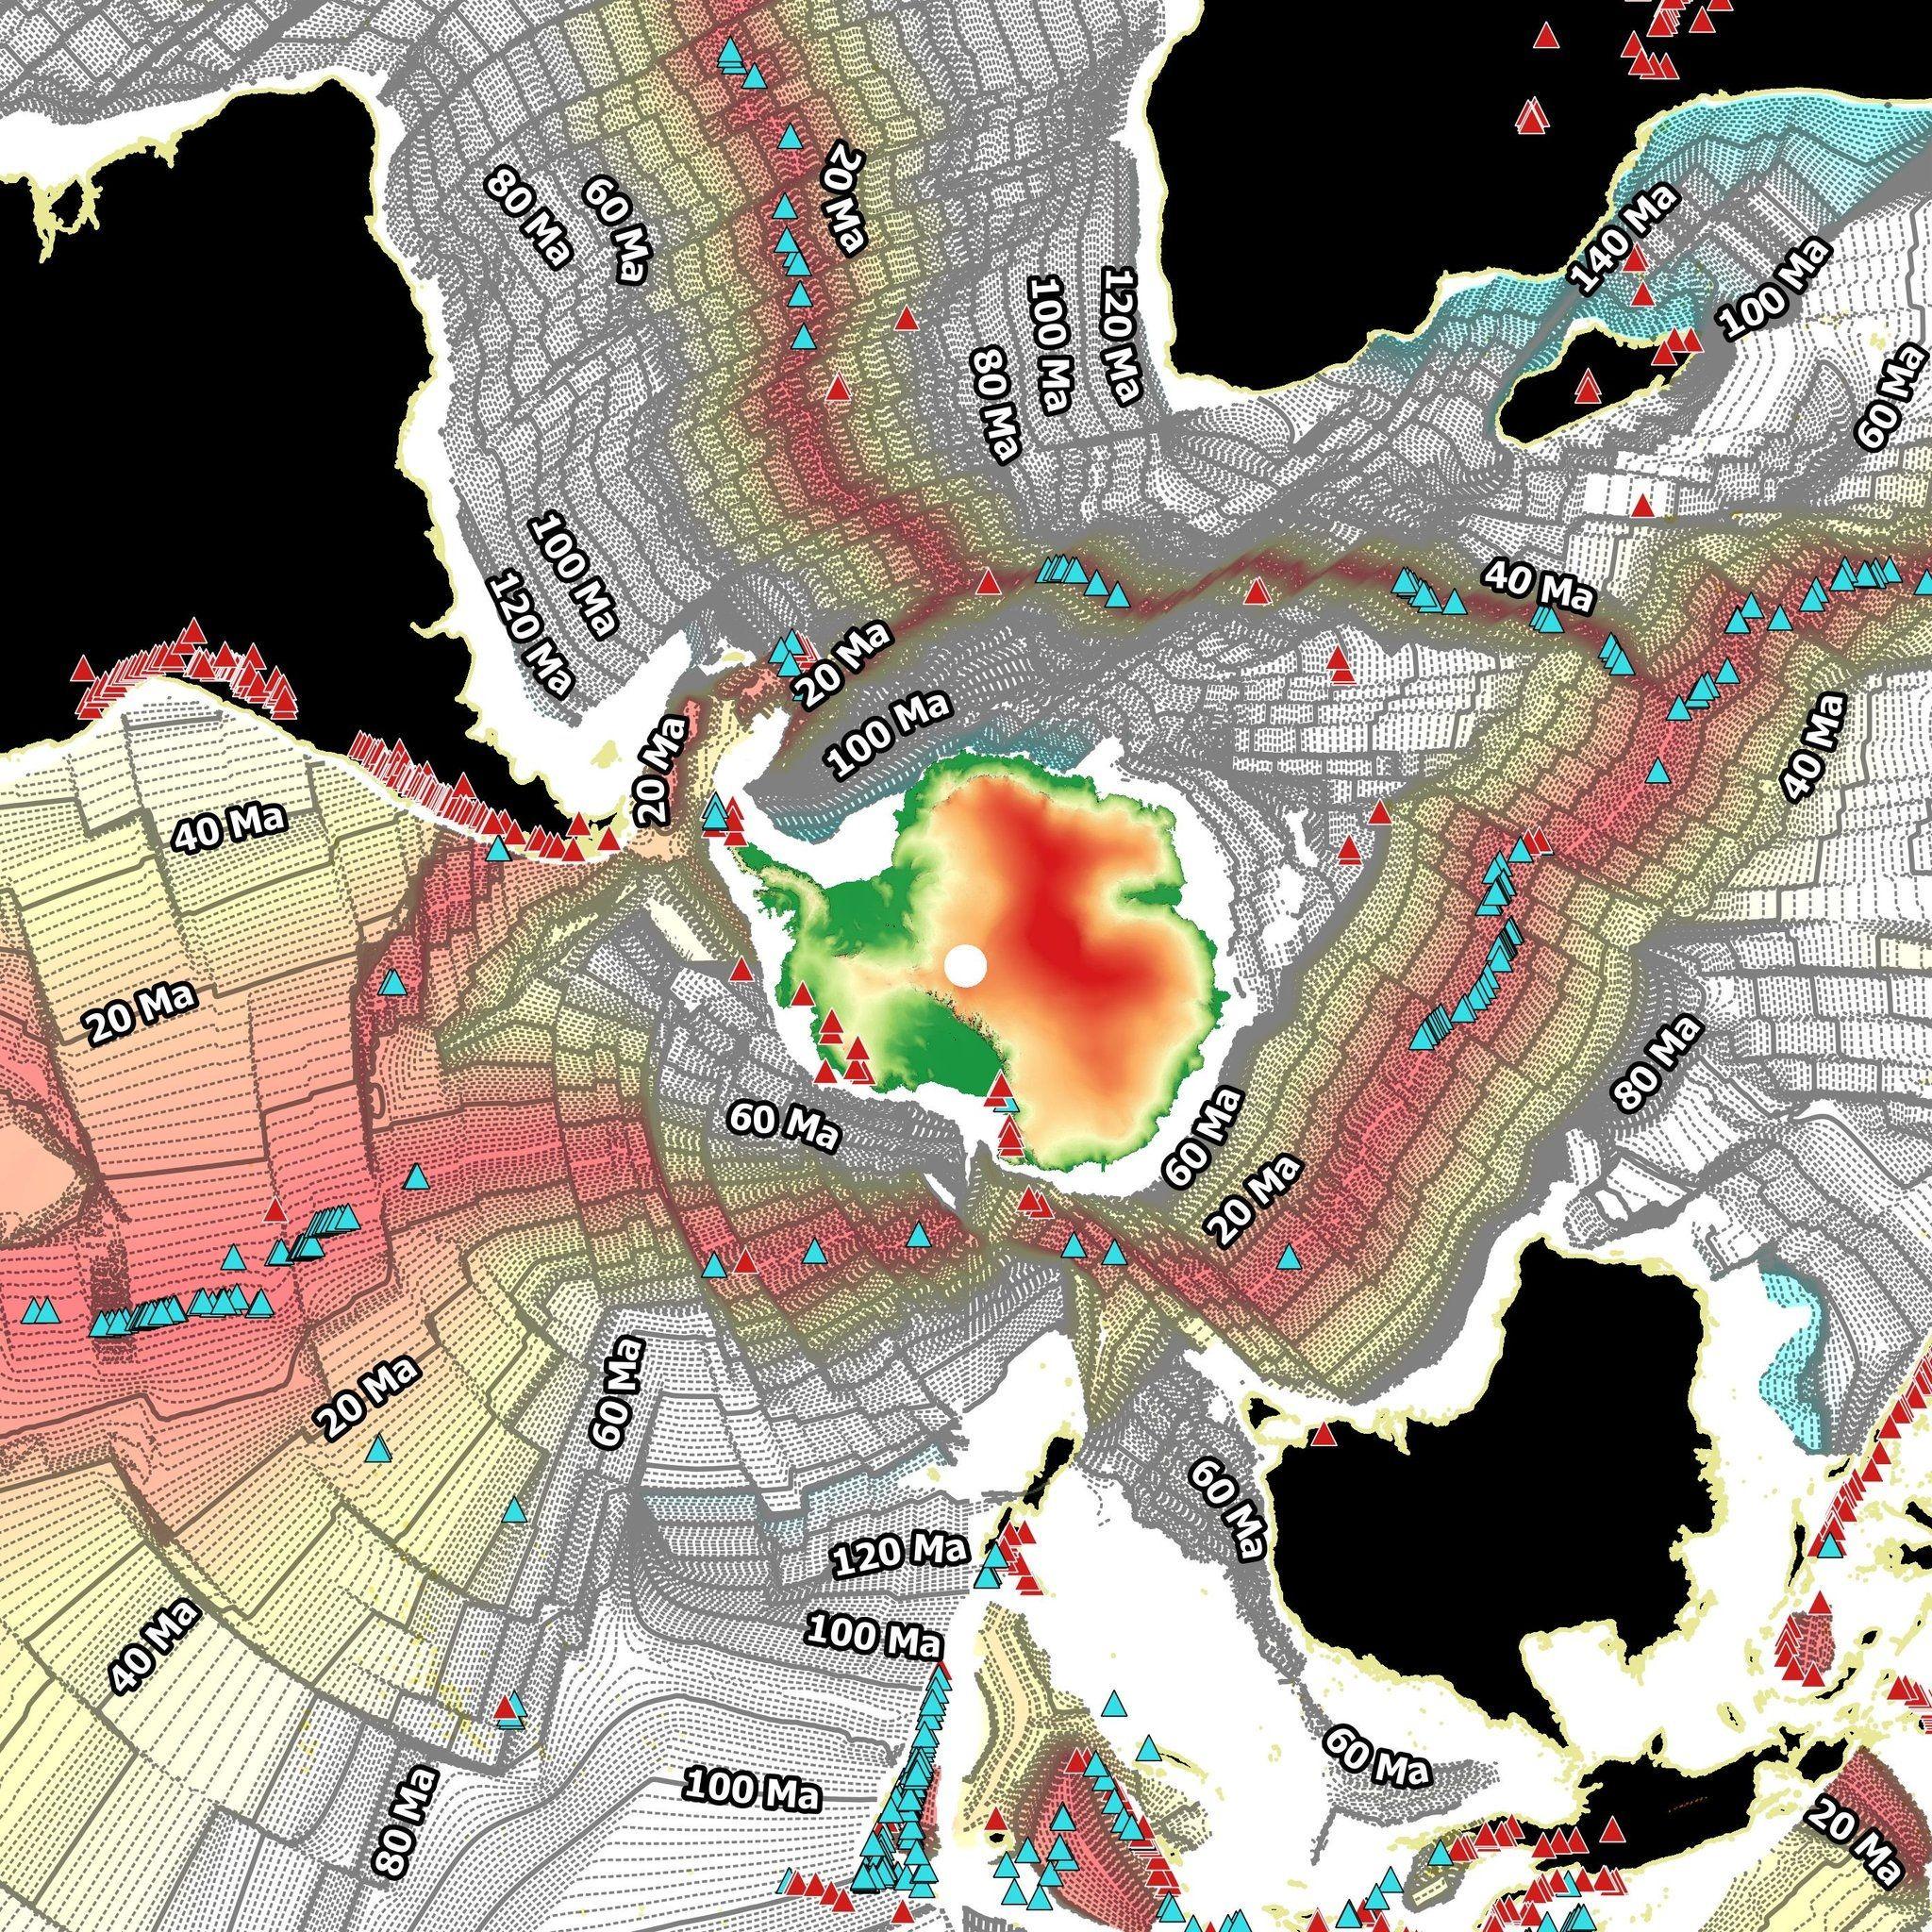 Sea Floor Spreading Centered On Antartica